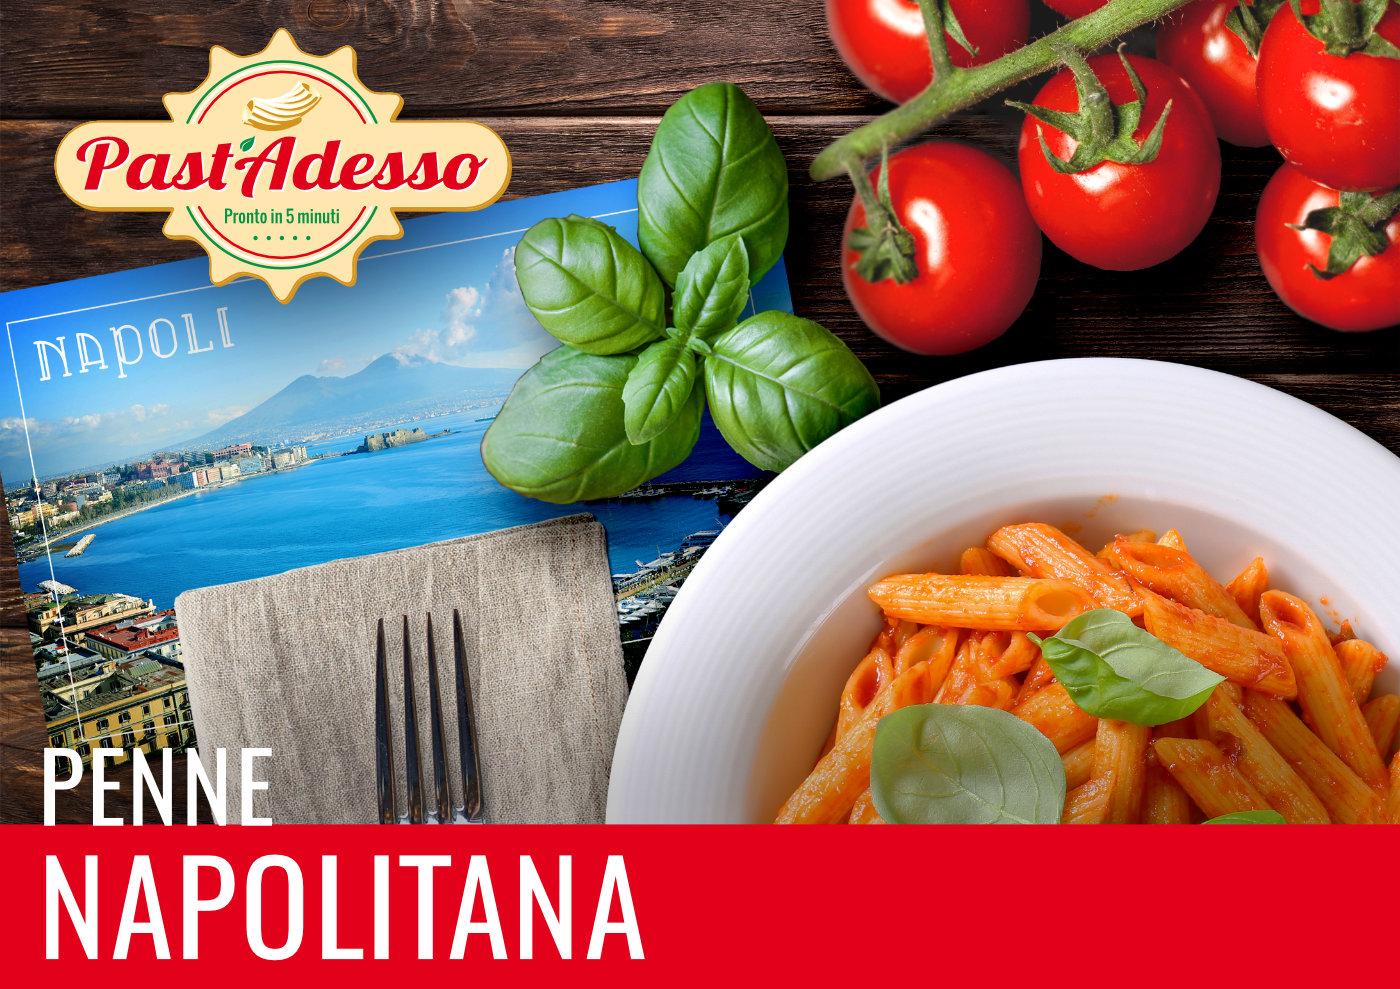 DW-PastAdesso-PenneNapolitana_CVR